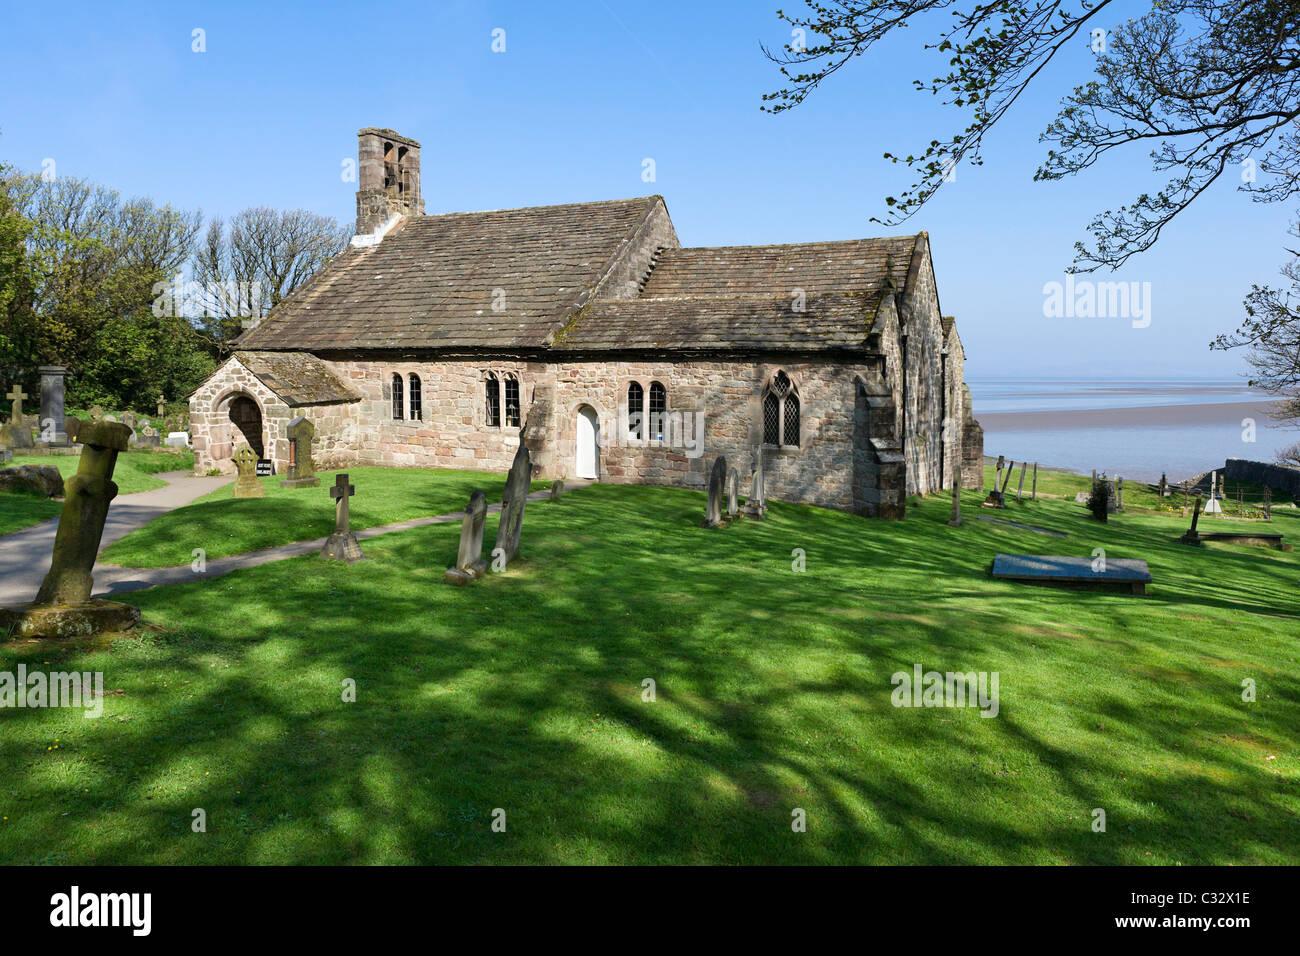 The historic St Peter's church in Heysham Village, near Morecambe, Lancashire, UK - Stock Image